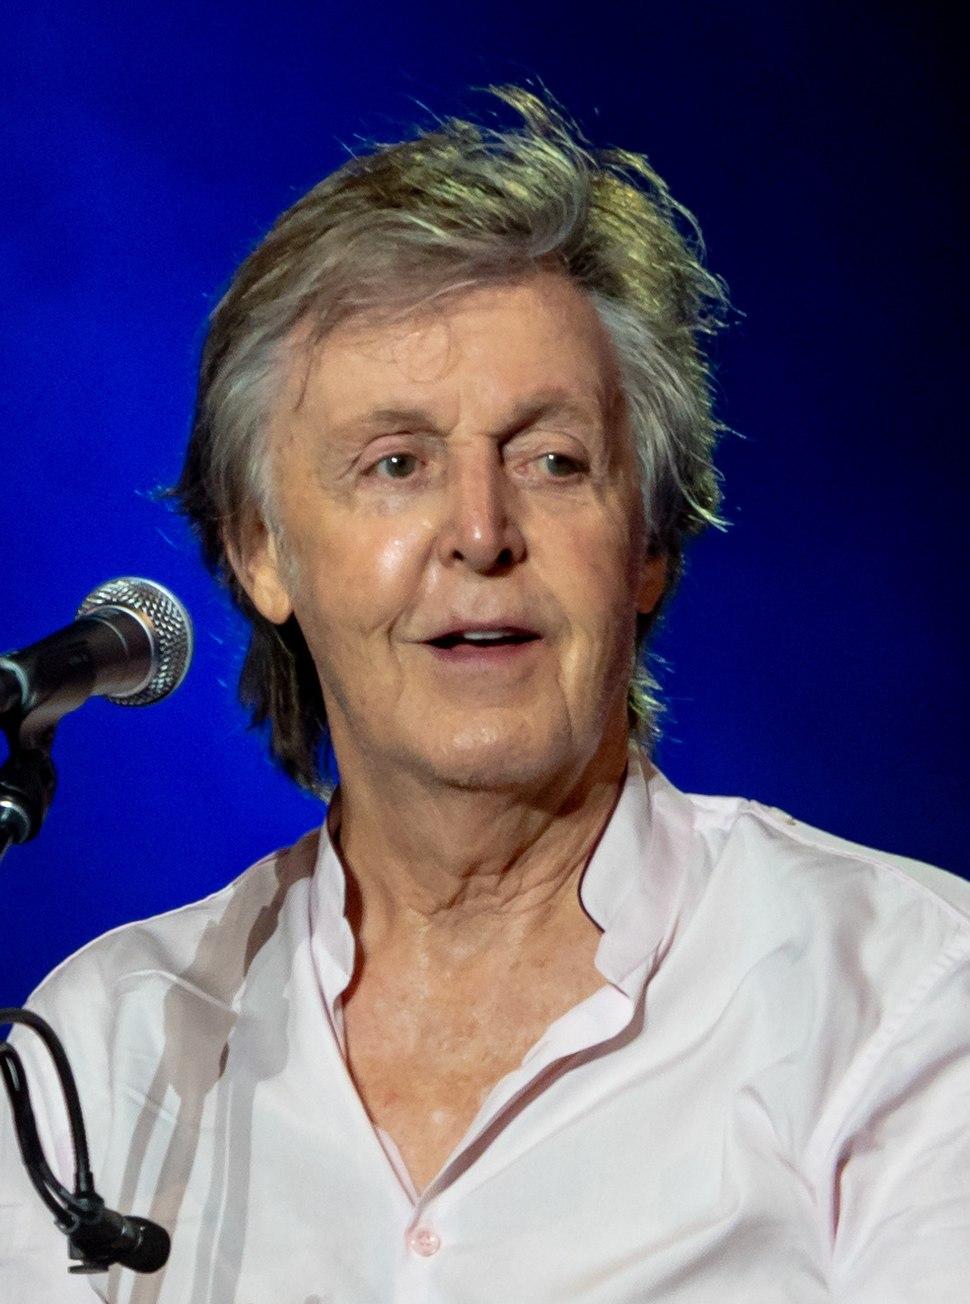 McCartney smiling